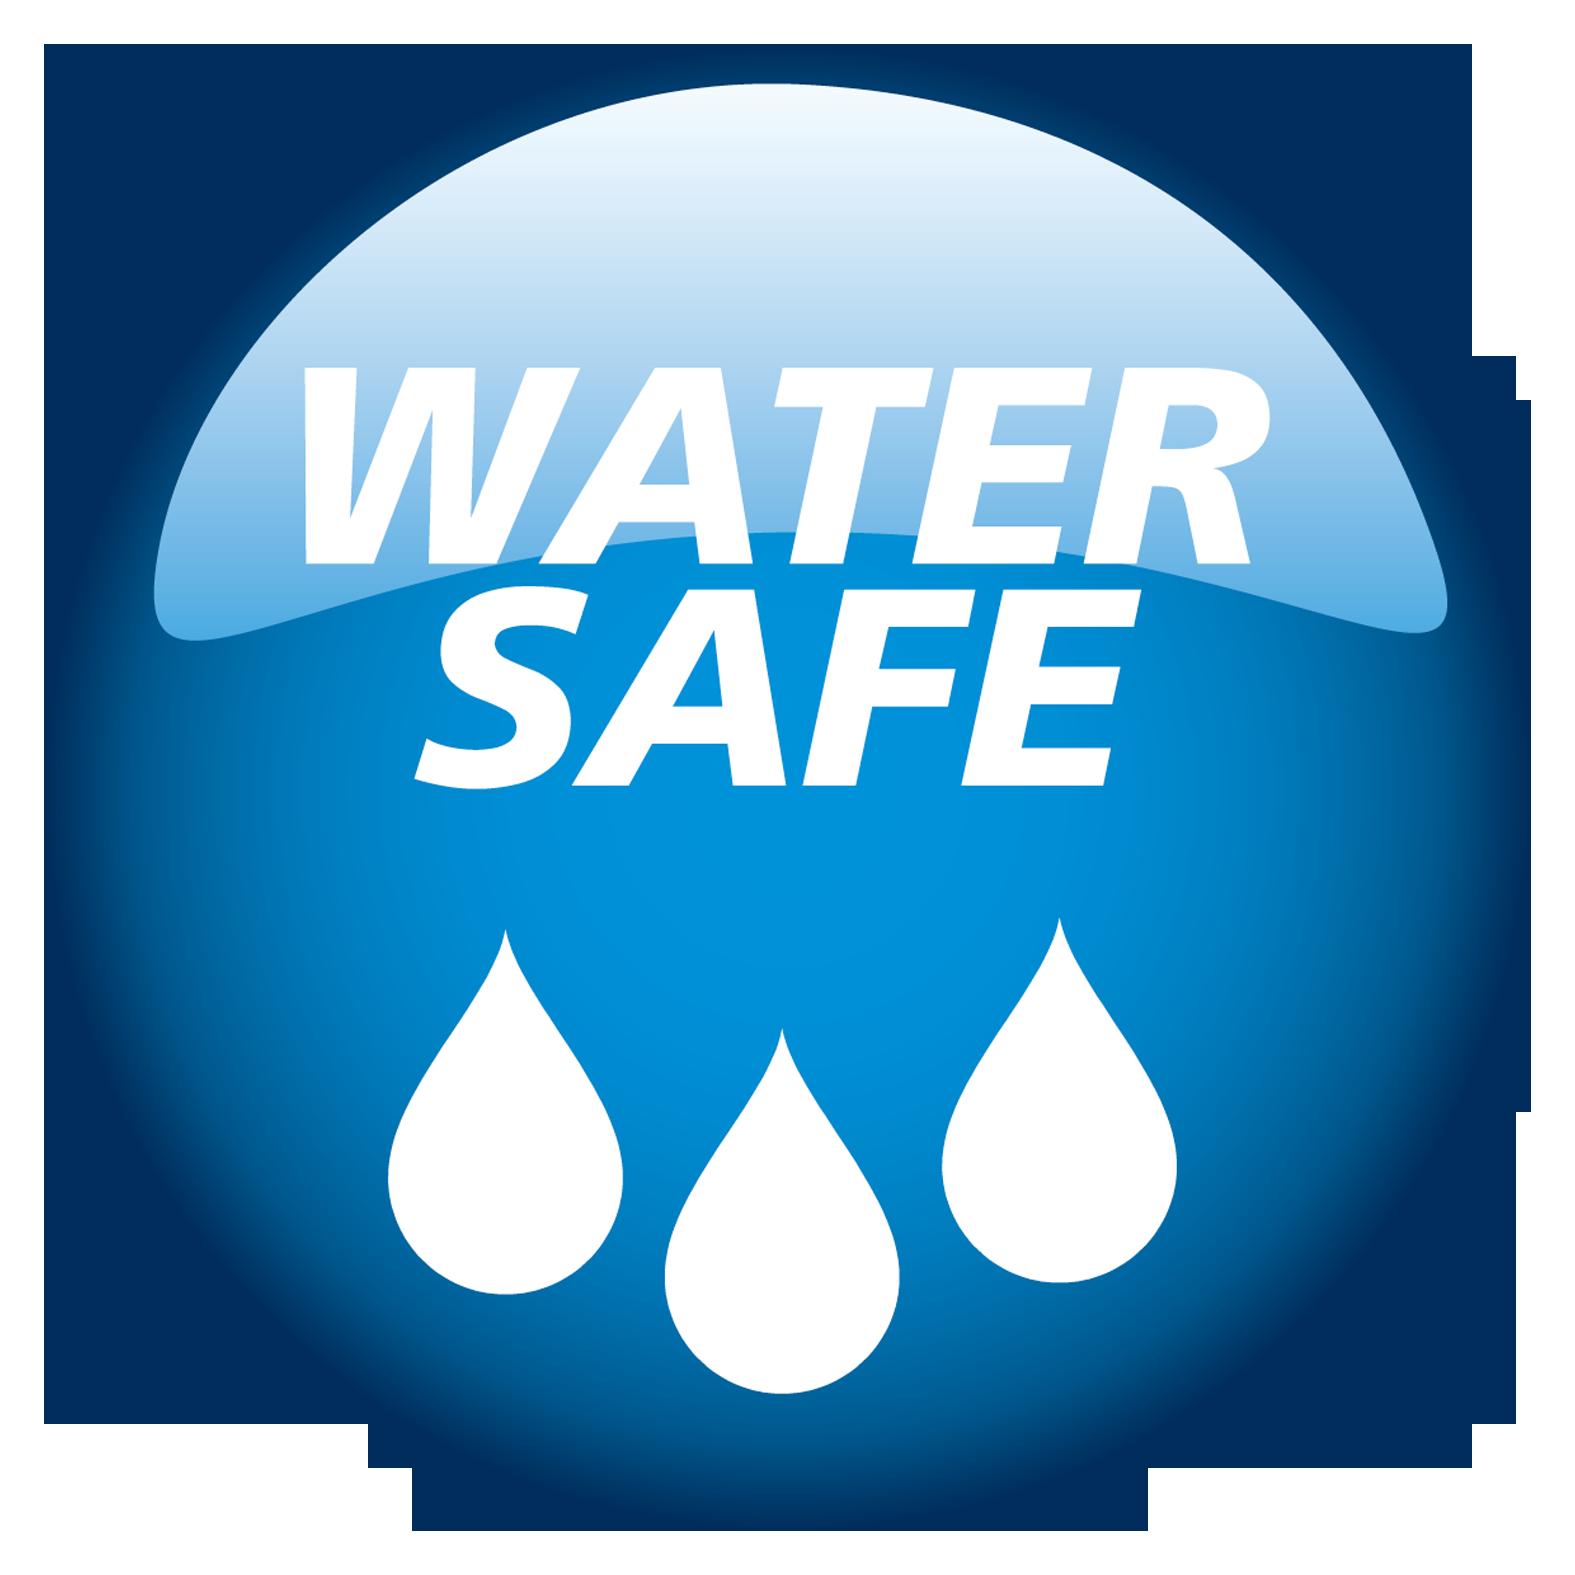 WaterSafe sigurnosni sistem